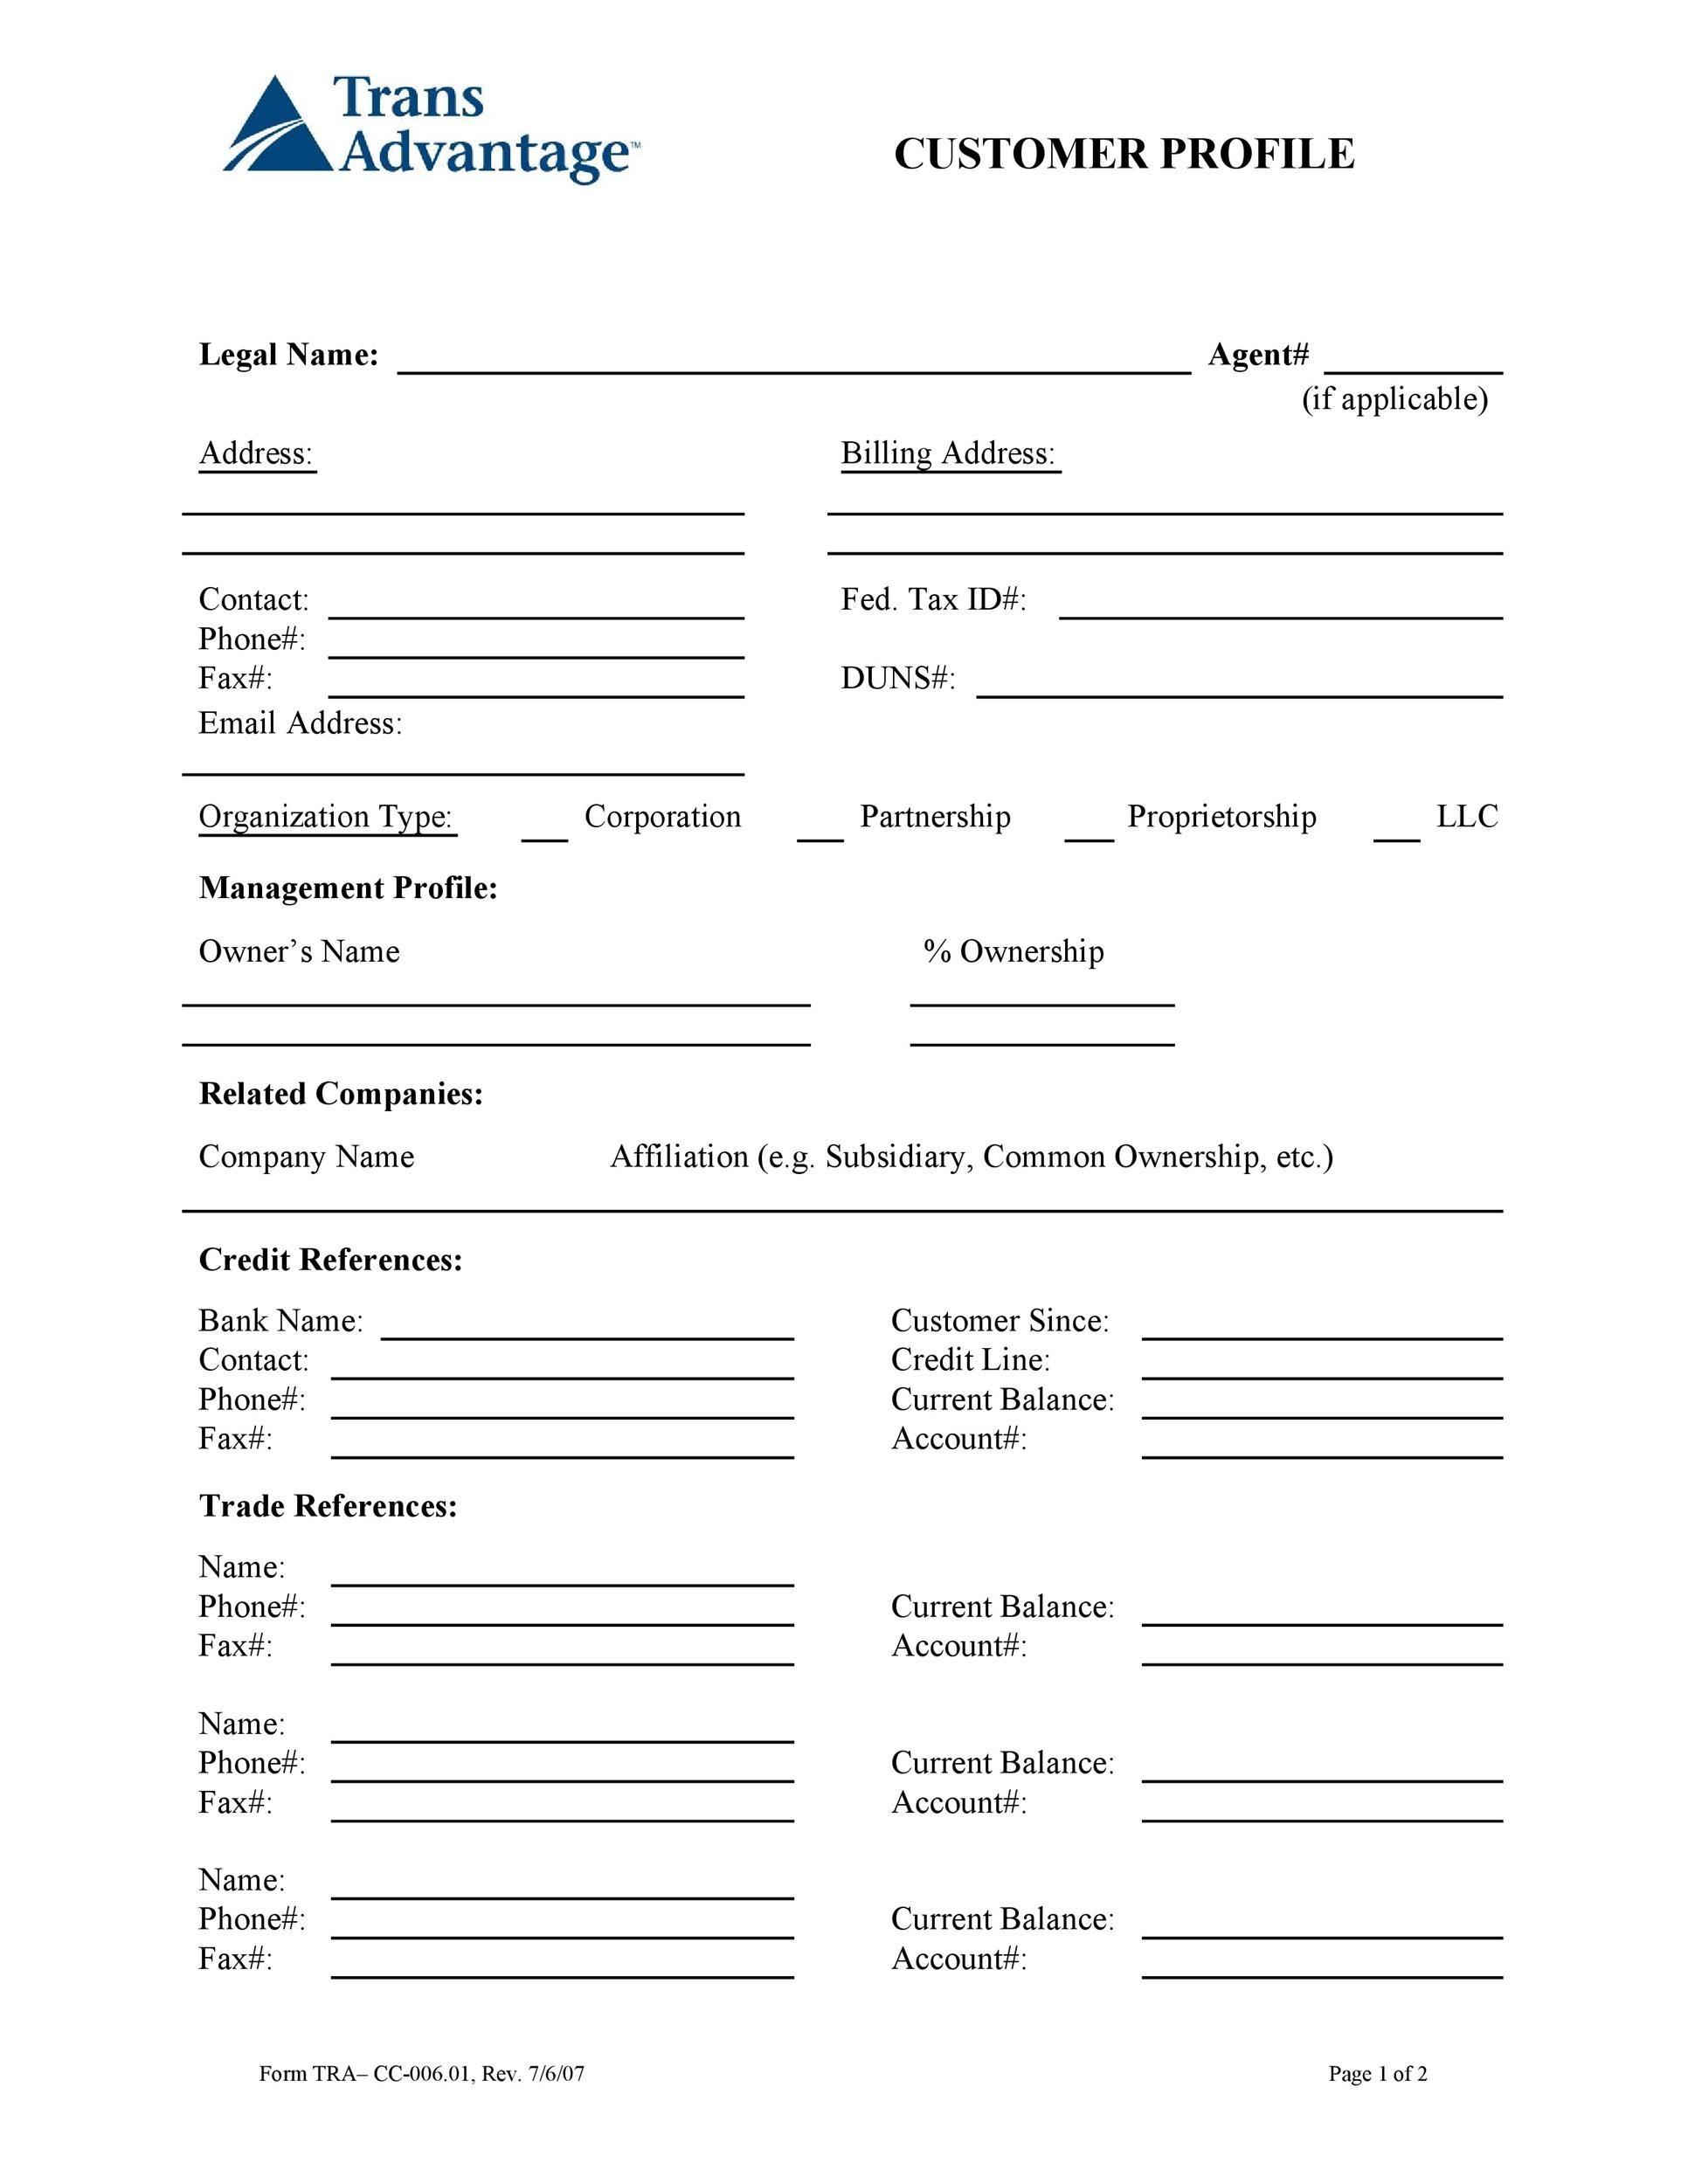 Free customer profile template 18